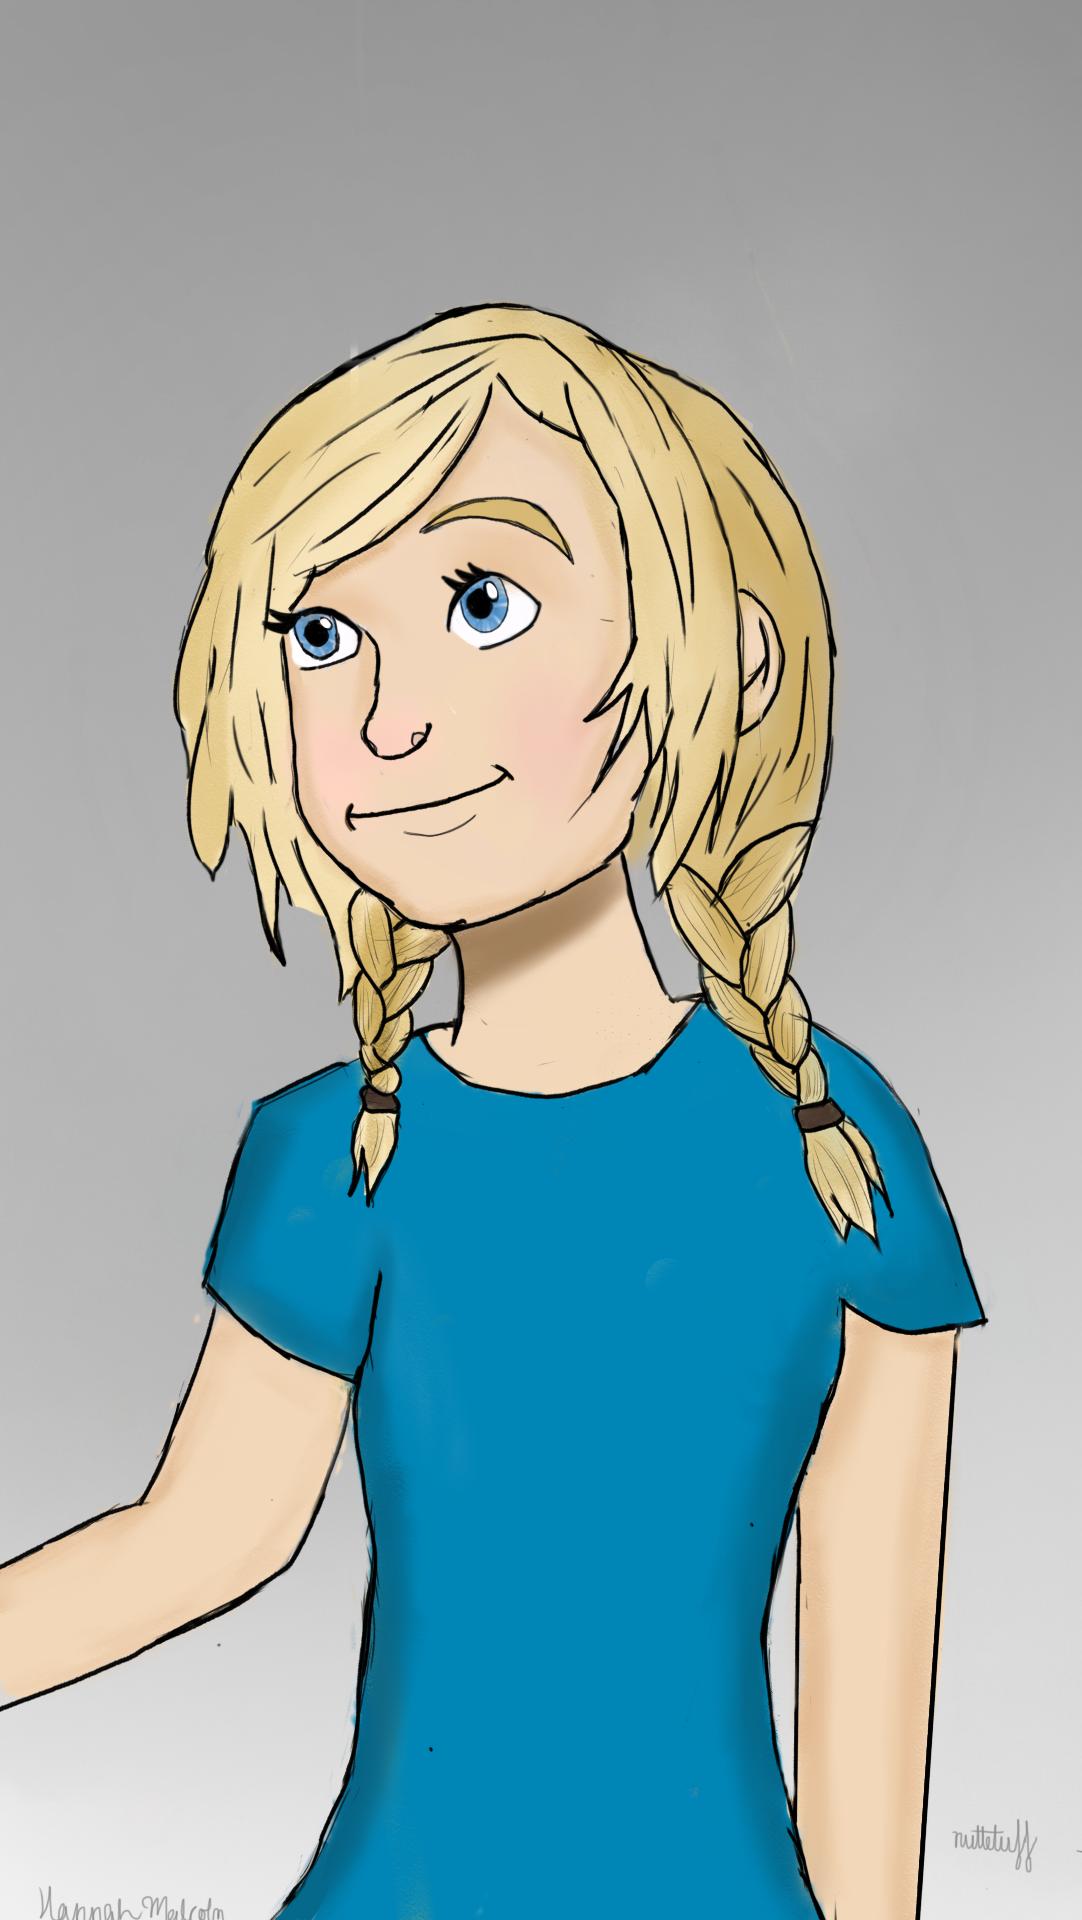 Little Astrid